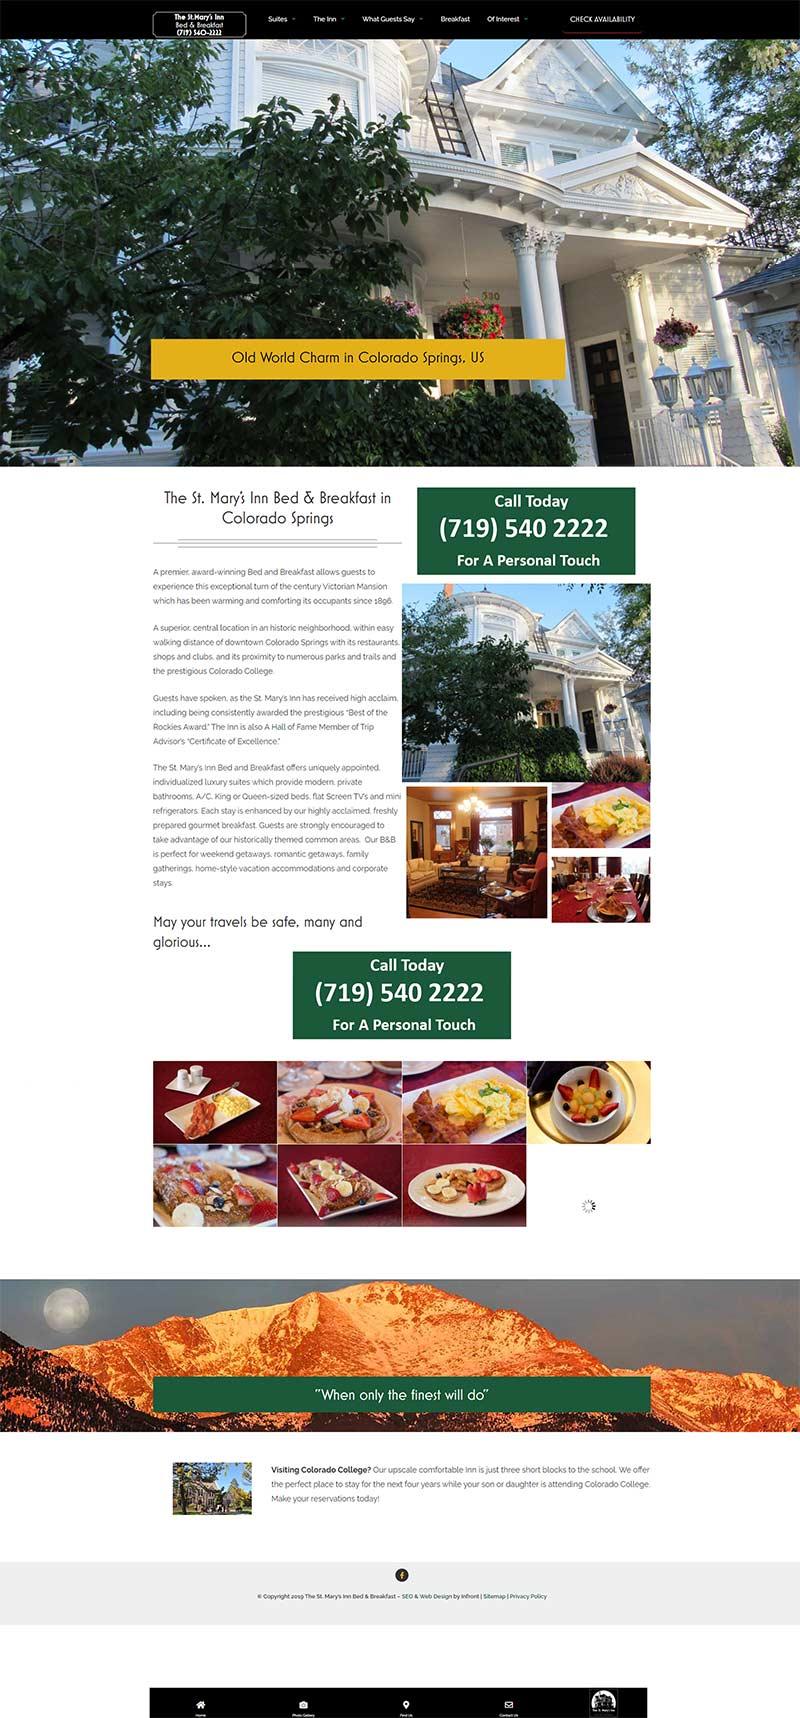 saint marys inn bed and breakfast full screenshots